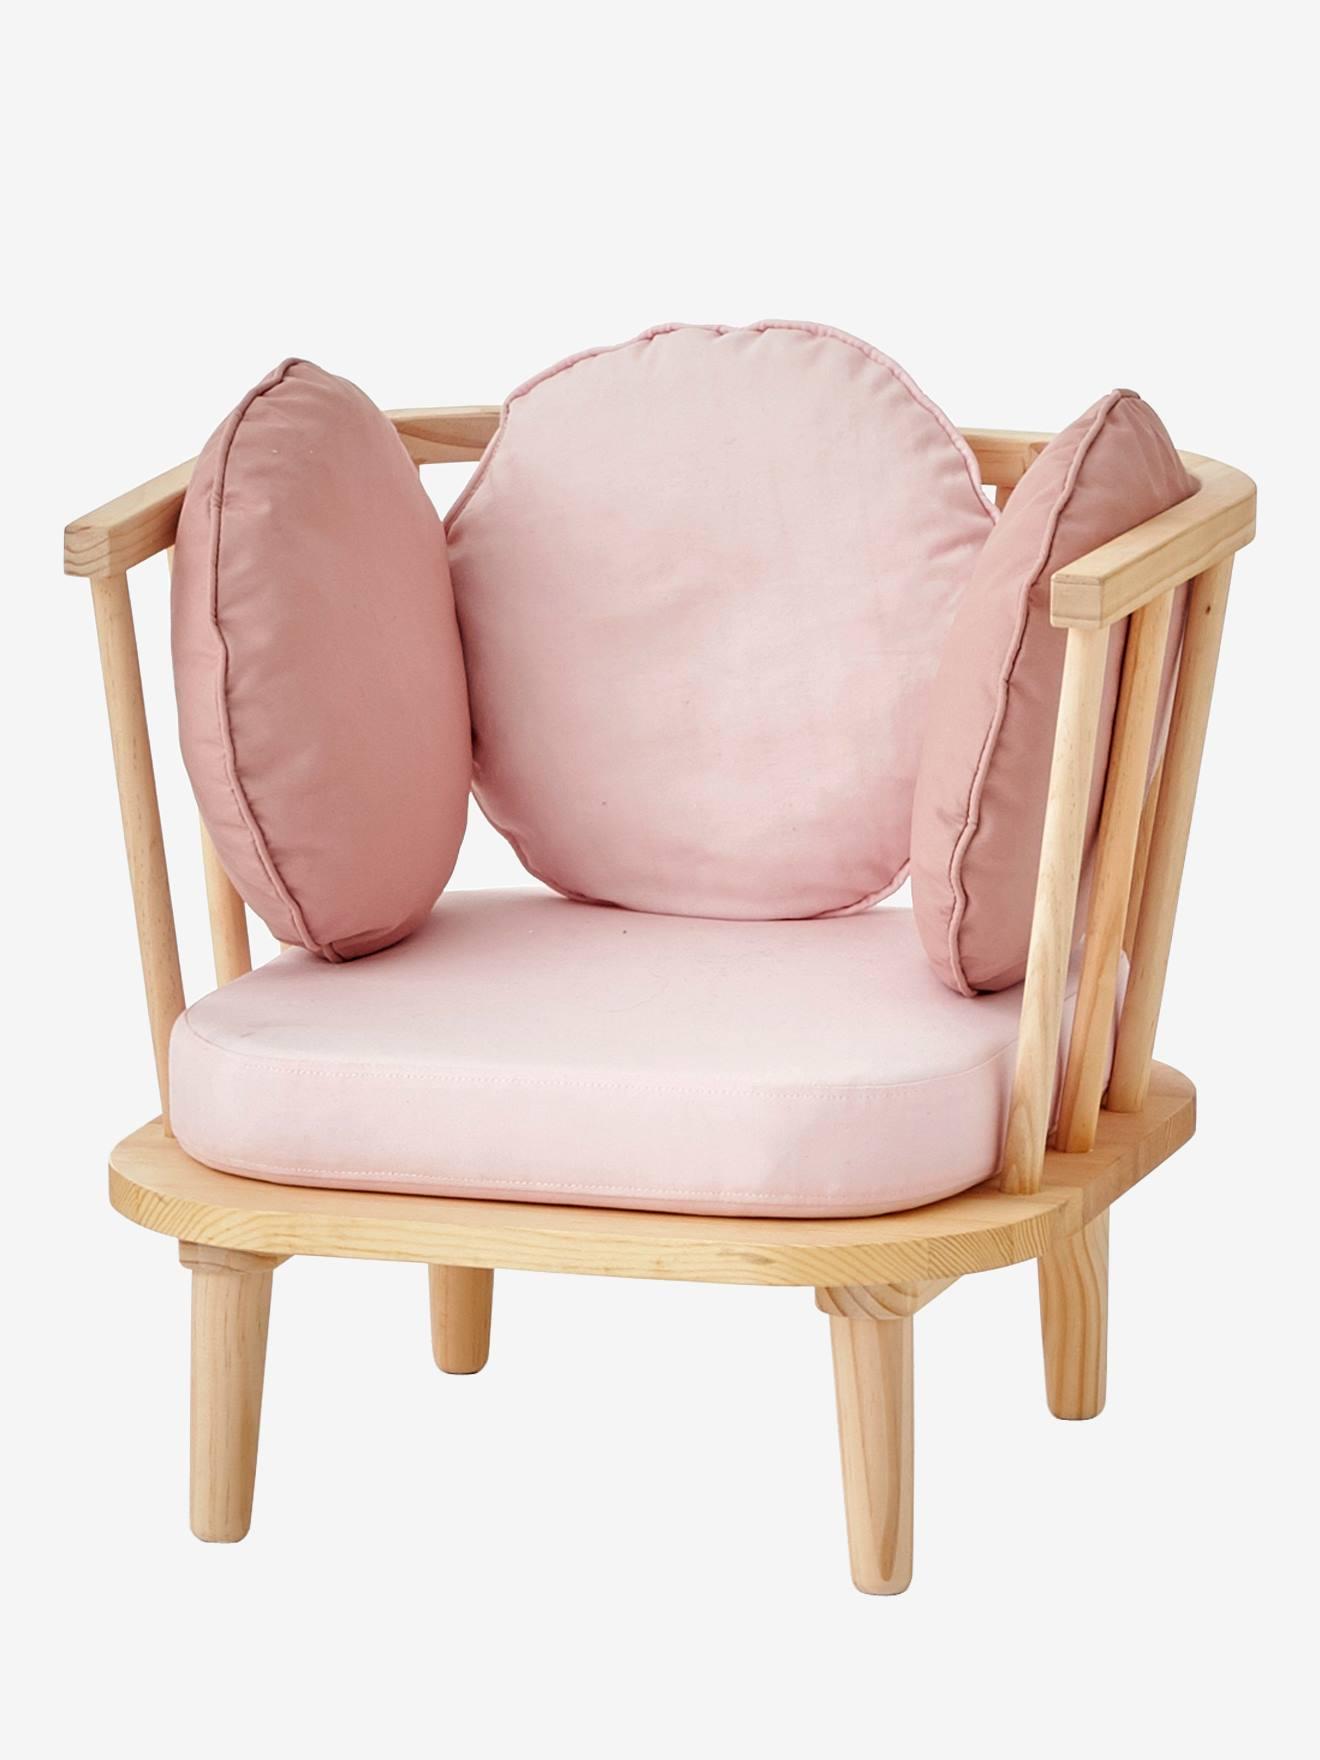 sessel retro vidaxl retro holz lehnstuhl relaxsessel. Black Bedroom Furniture Sets. Home Design Ideas